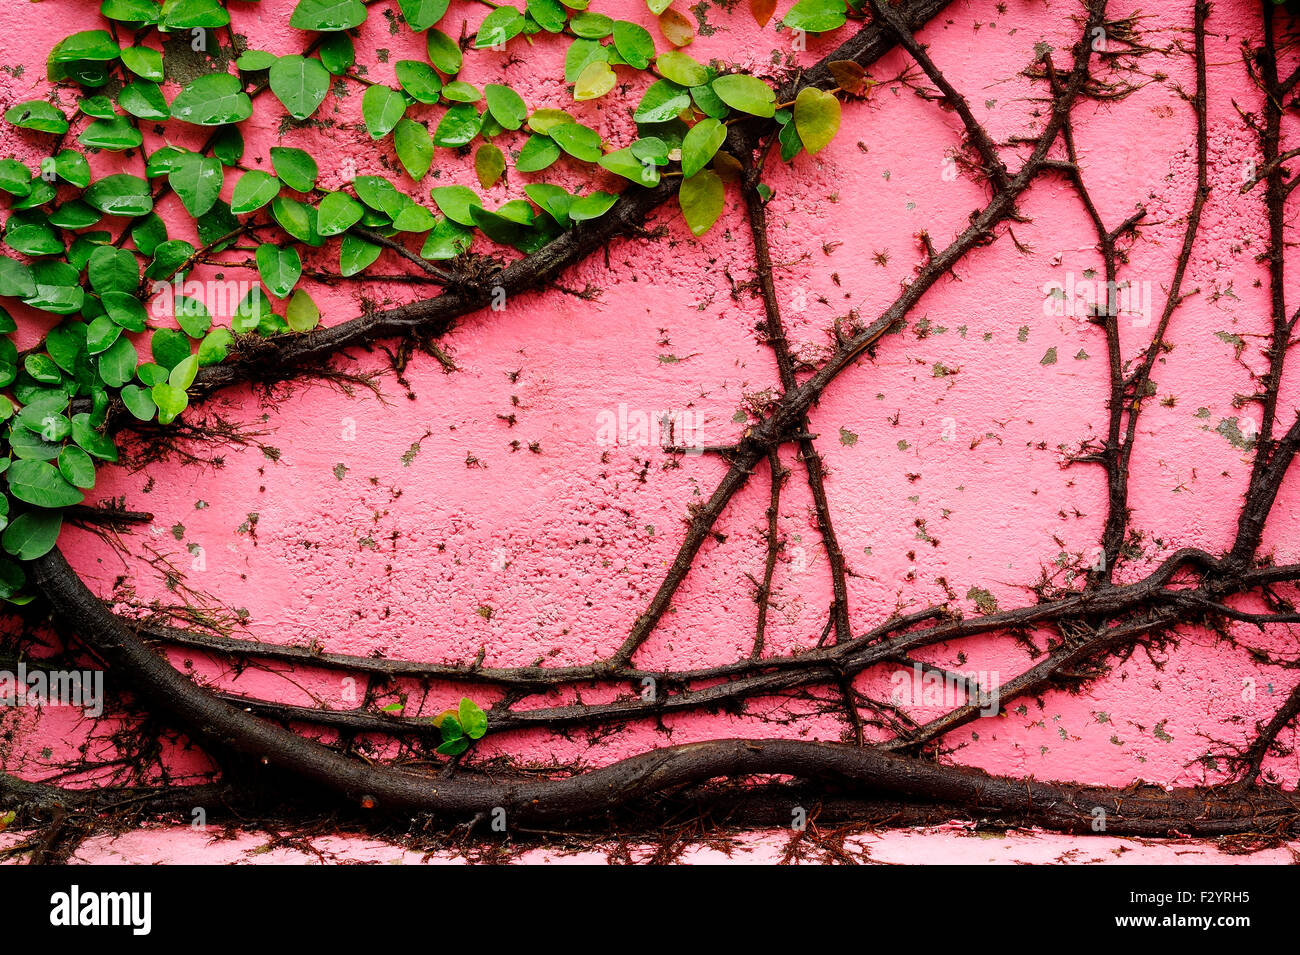 creeper plant on pink wall creates - Stock Image